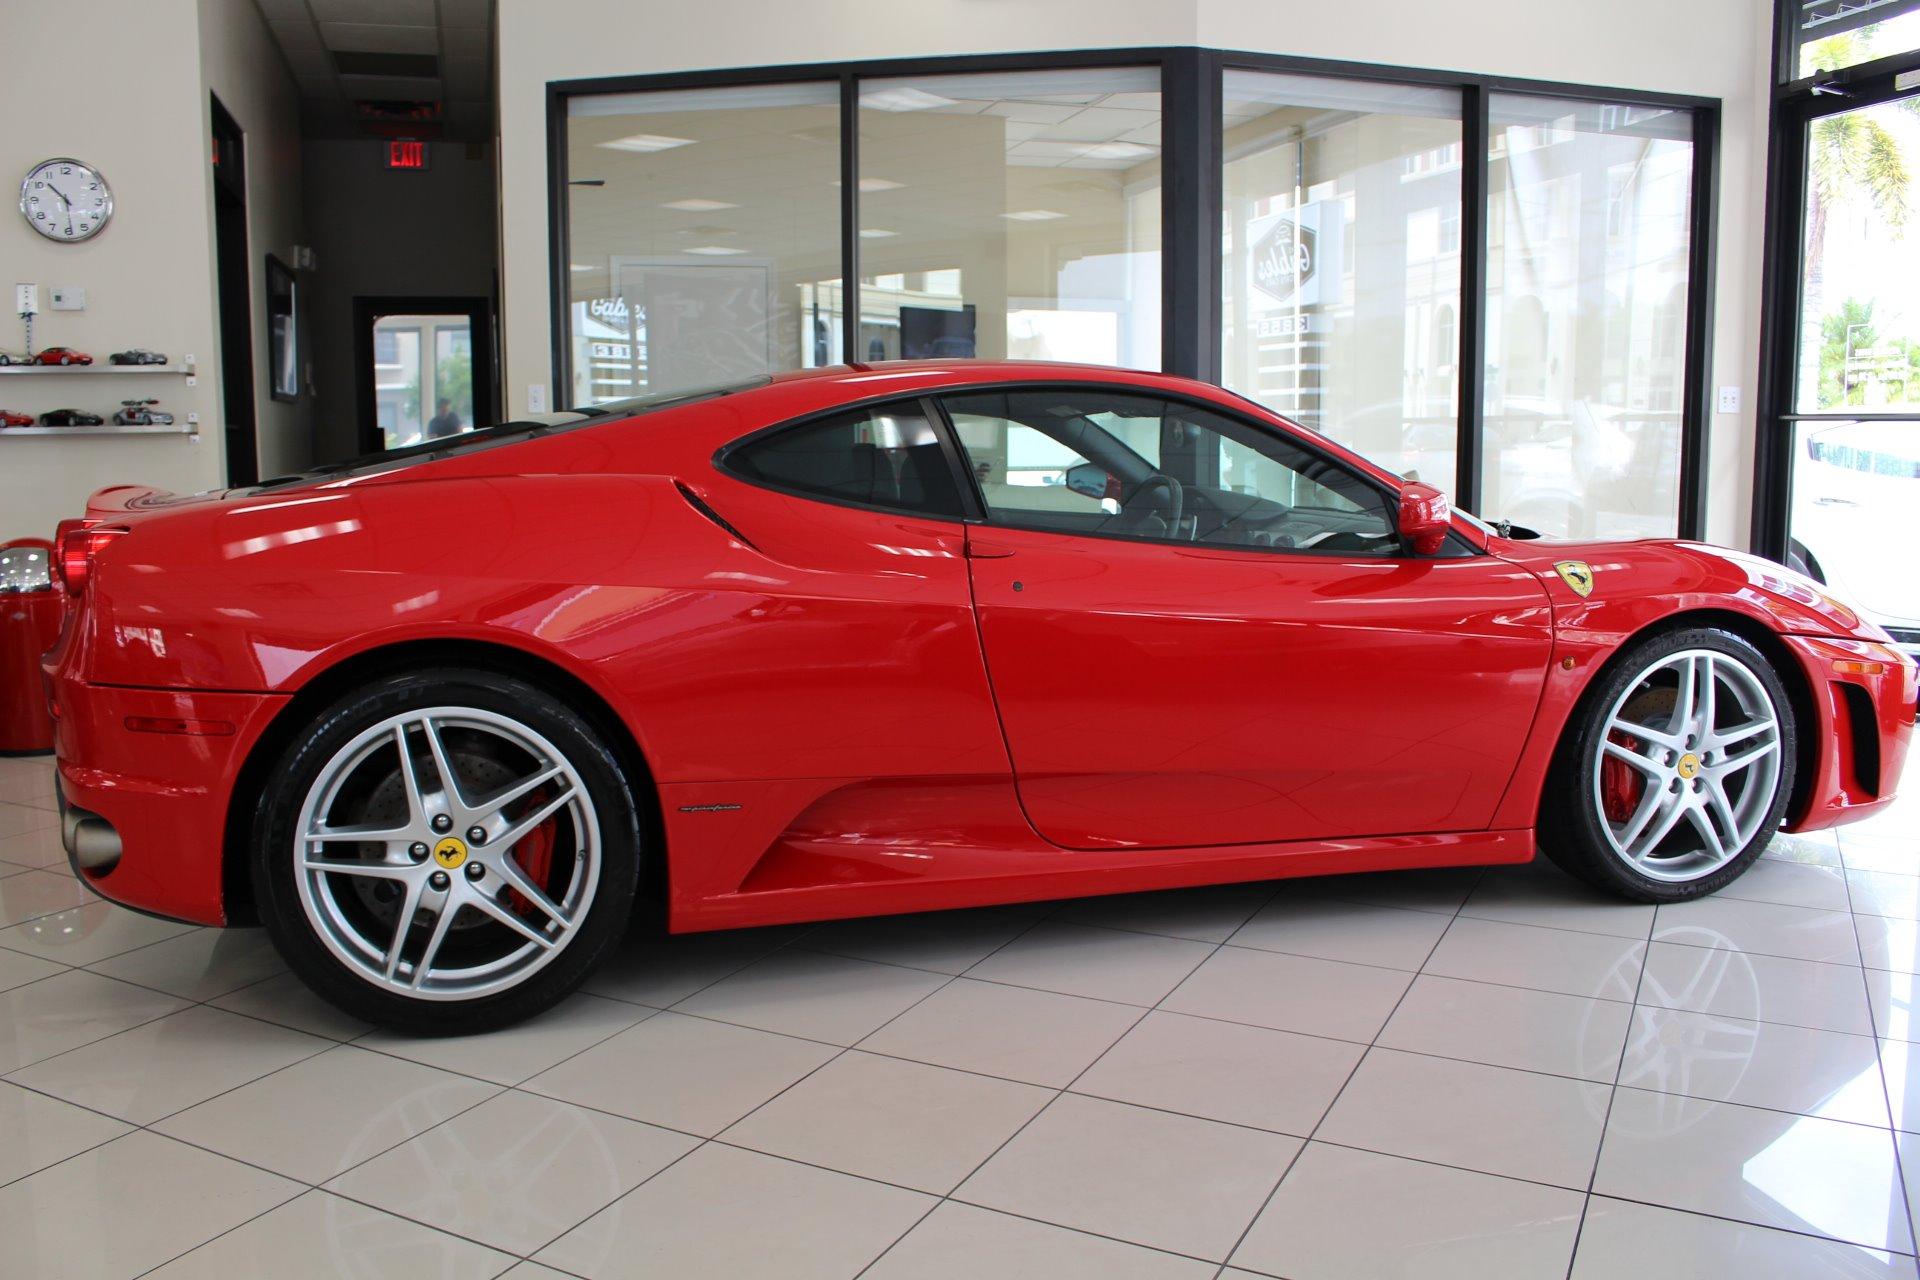 Used 2005 Ferrari F430 for sale $88,850 at The Gables Sports Cars in Miami FL 33146 3